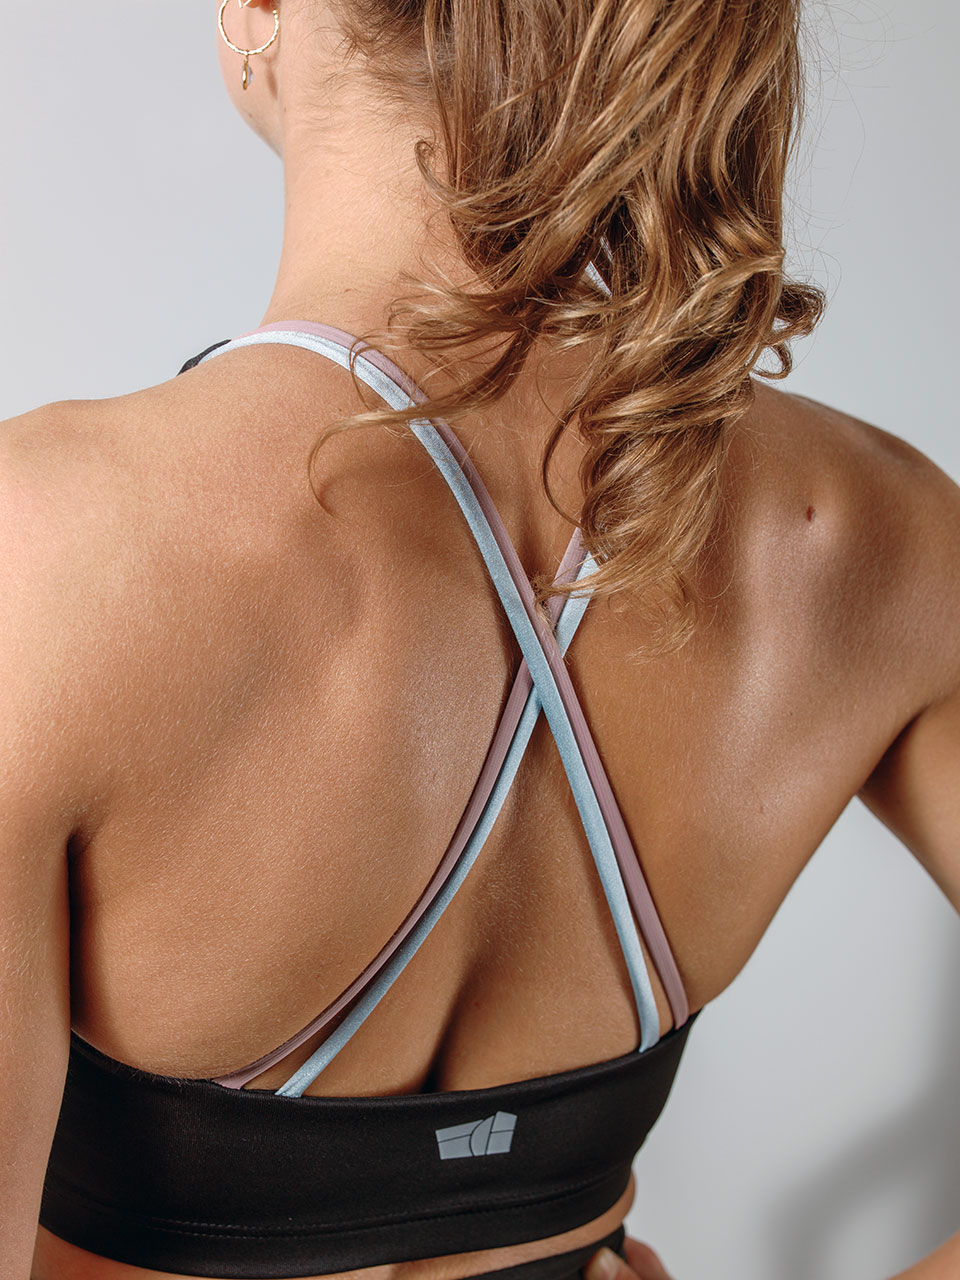 Motus Sports Bra - straps detail